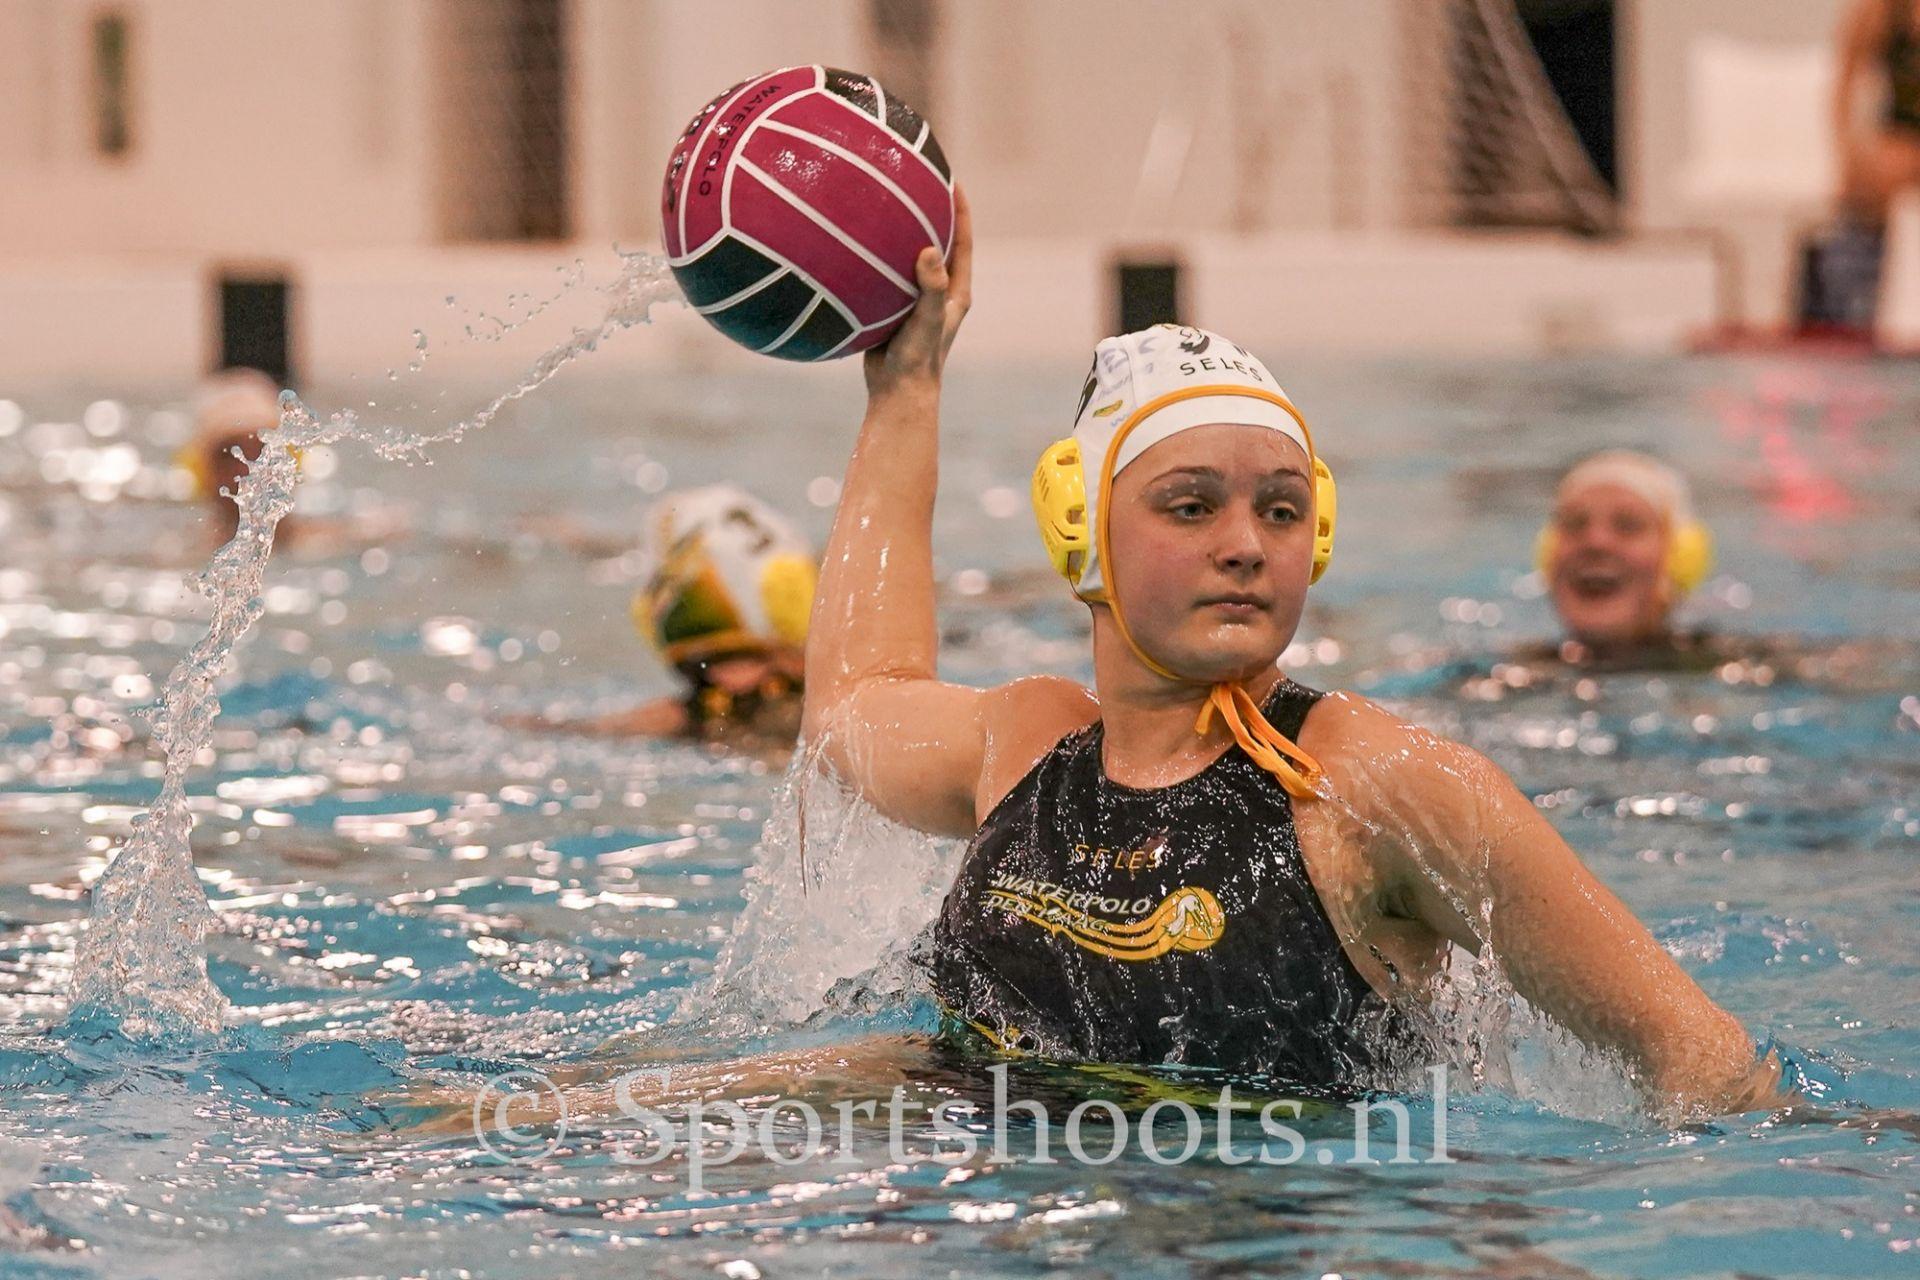 20200125-Waterpolo-Den-Haag-Het-Y-dames-7-2000px